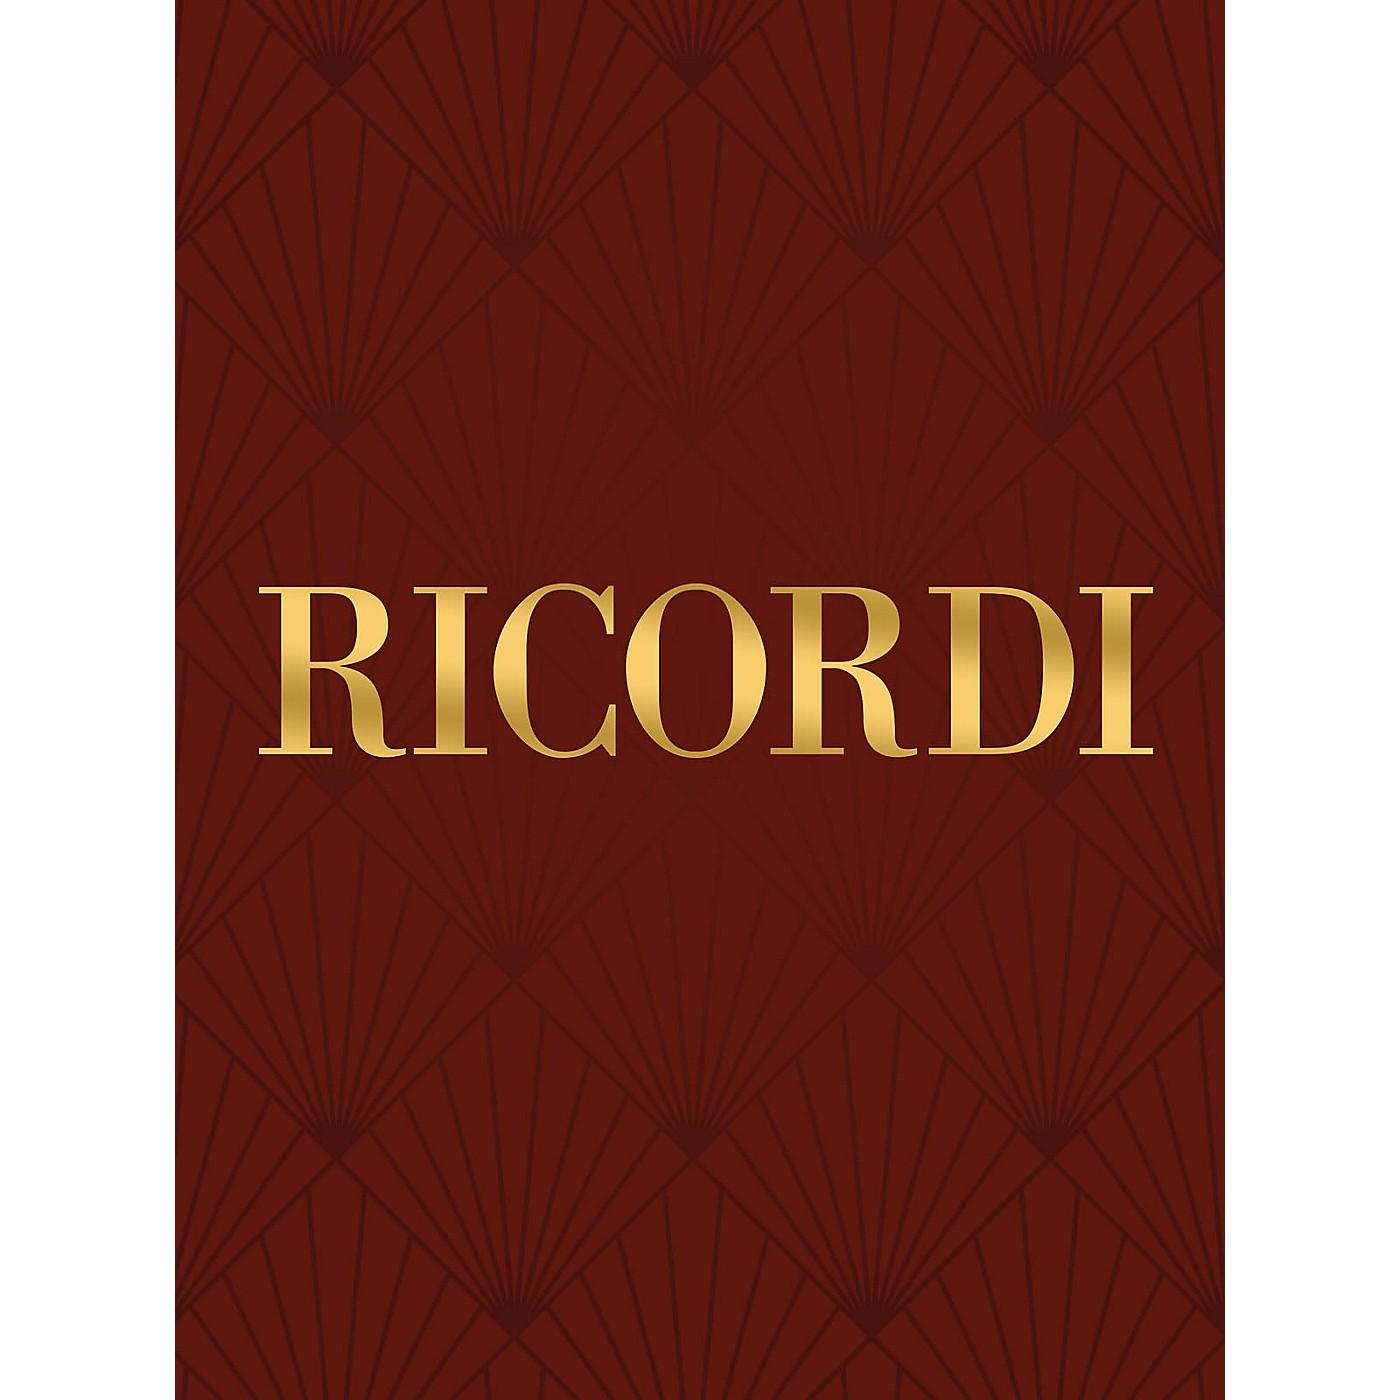 Ricordi Fontane di Roma, Pini di Roma, Feste Romane (Score) Study Score Series Softcover by Ottorino Respighi thumbnail